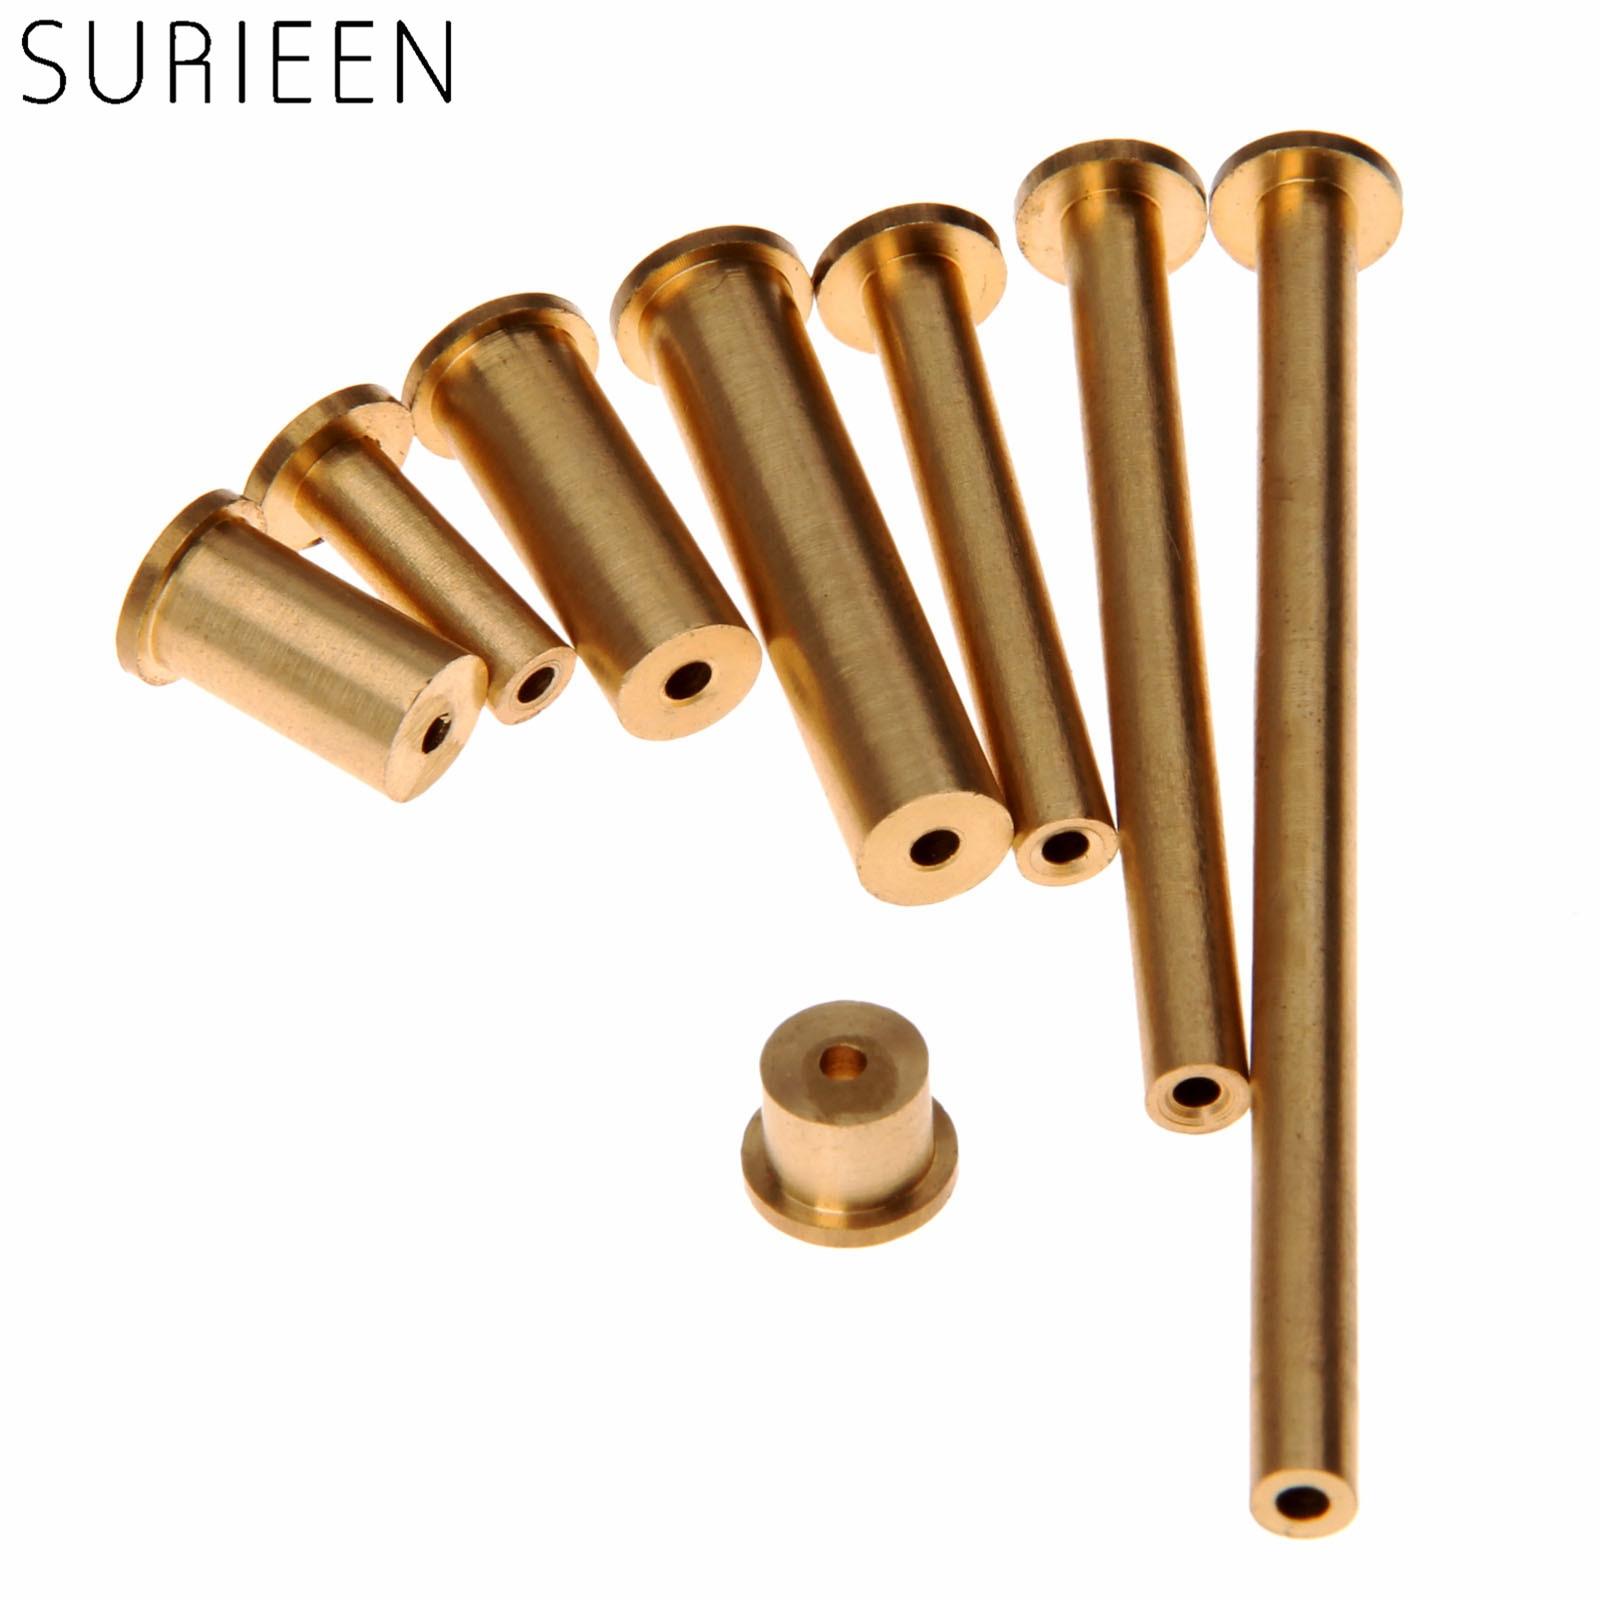 SURIEEN 8Pcs/ Set Gold Copper Nail Brass Plug Golf Weight Weights For .335 .355 .370 Tip Steel Shaft 2g 4g 6g 8g Club Head Kits